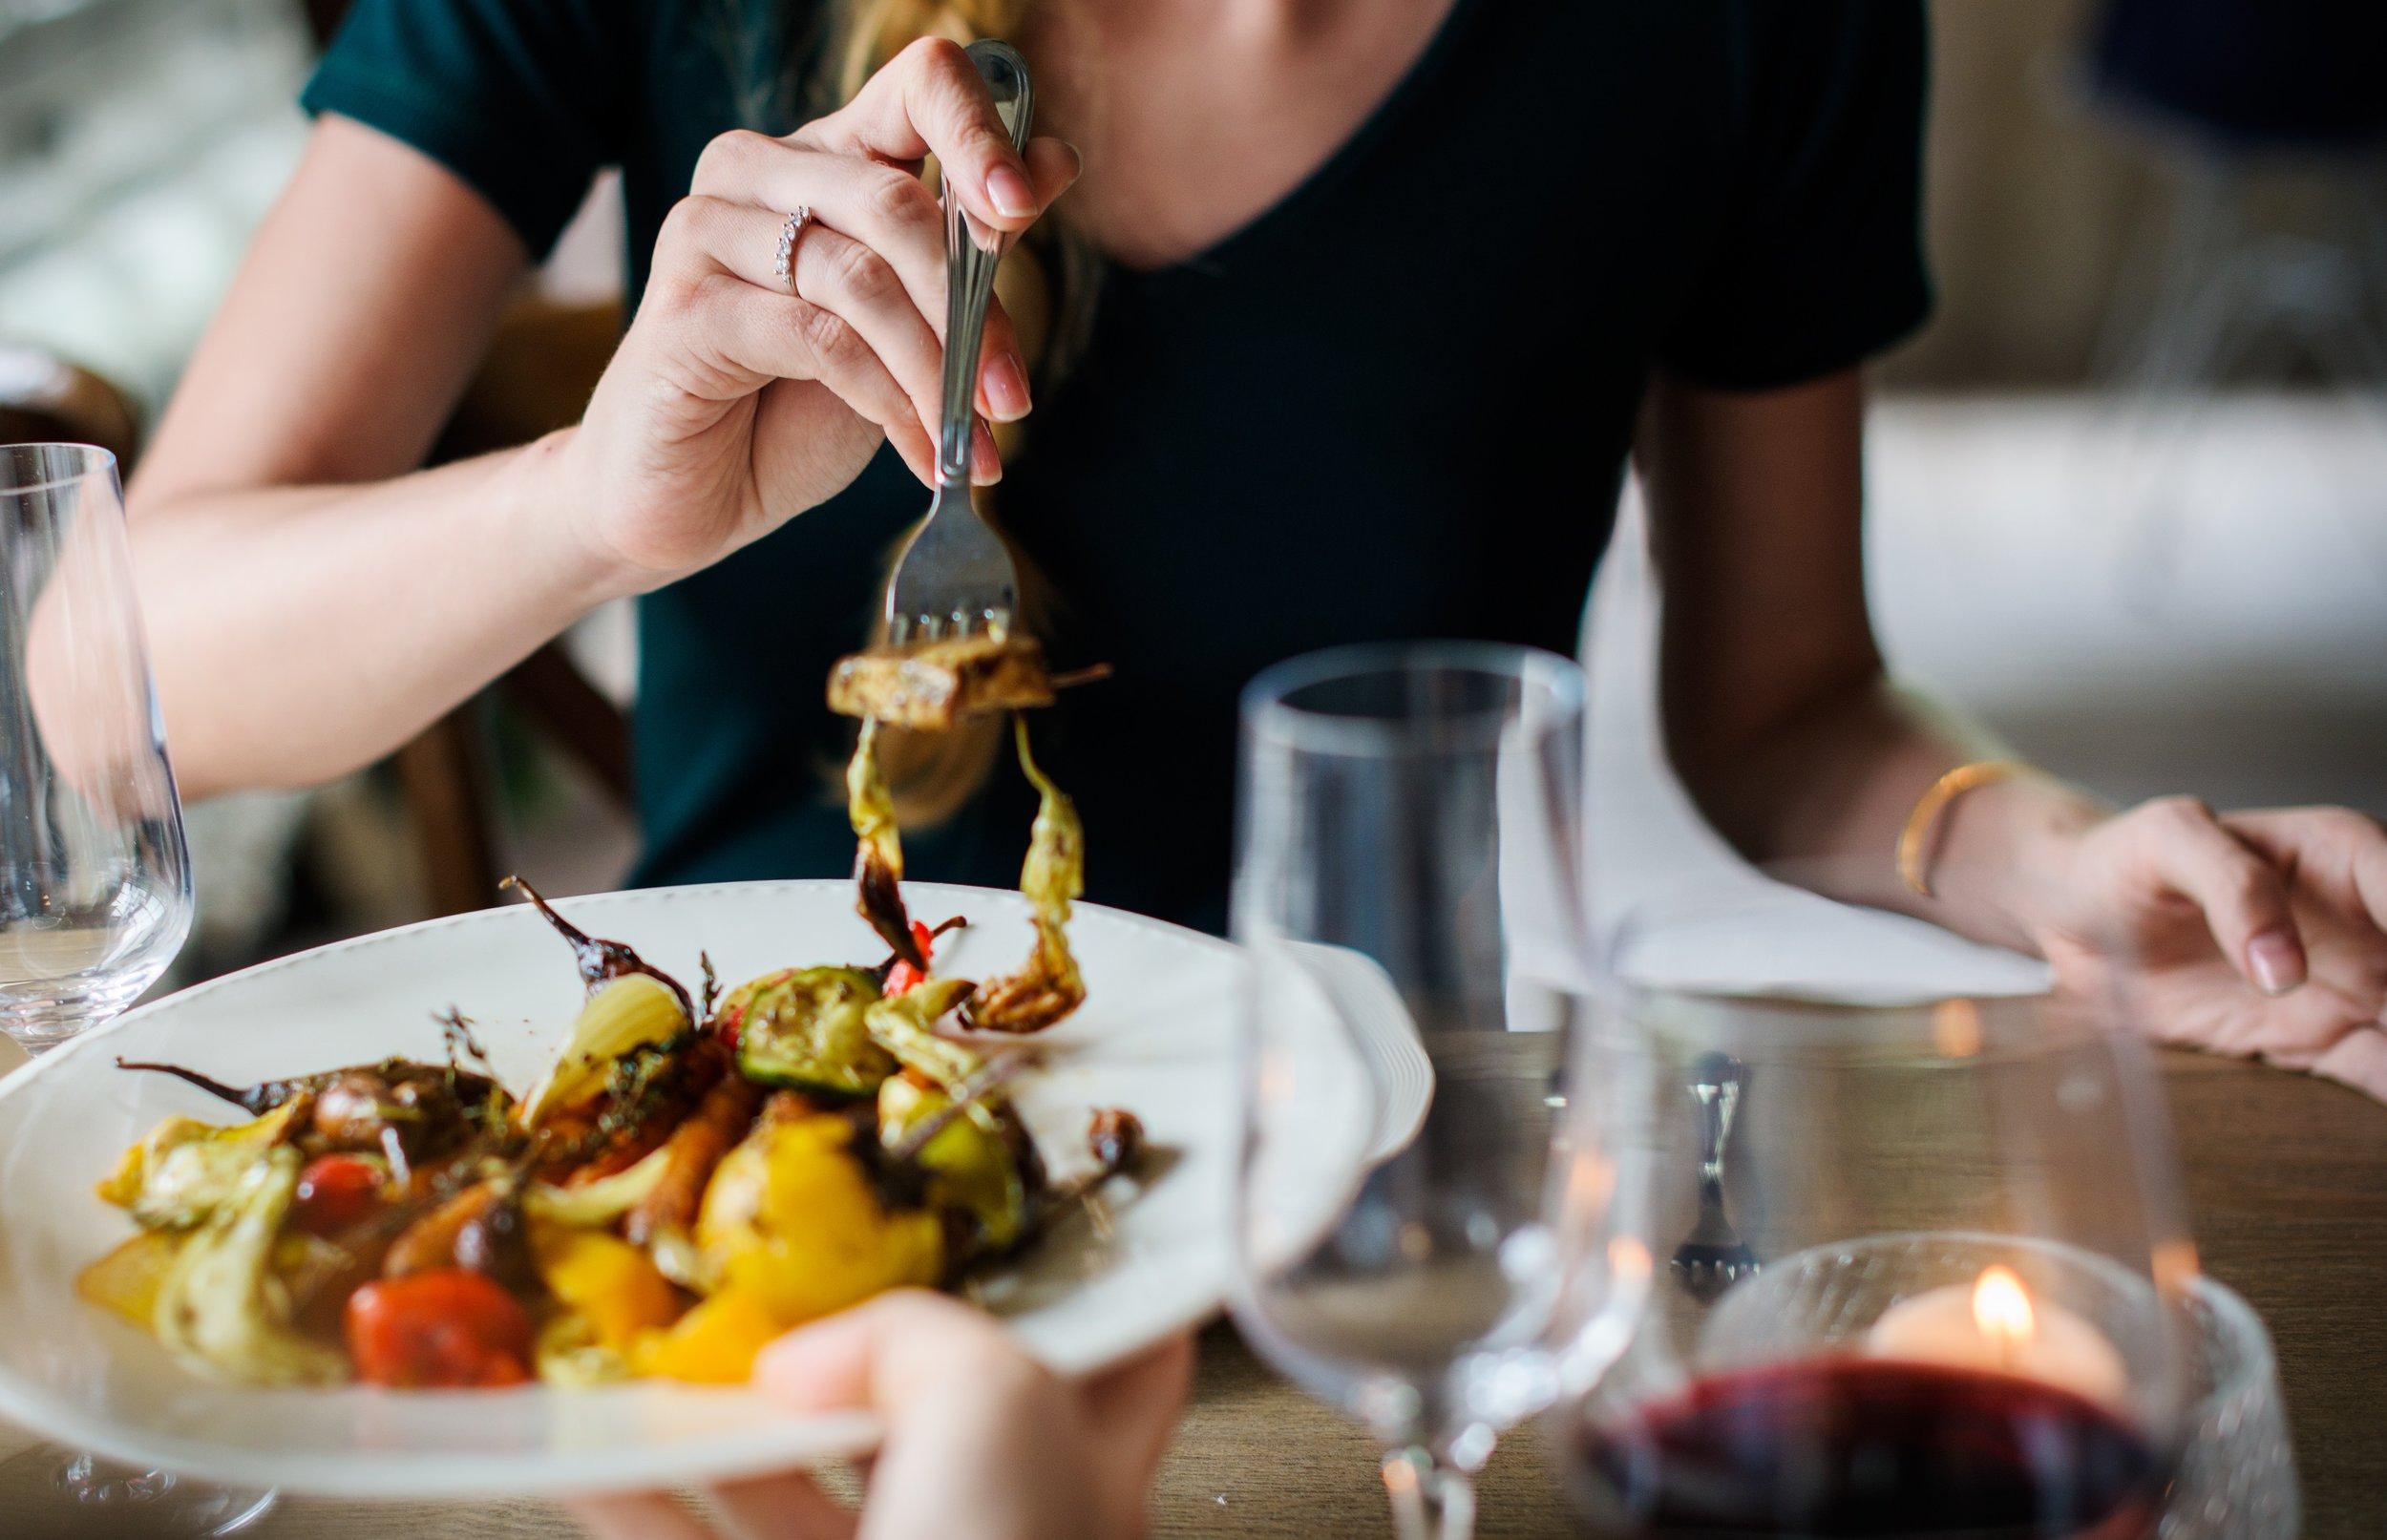 alcohol-blur-cuisine-390403.jpg